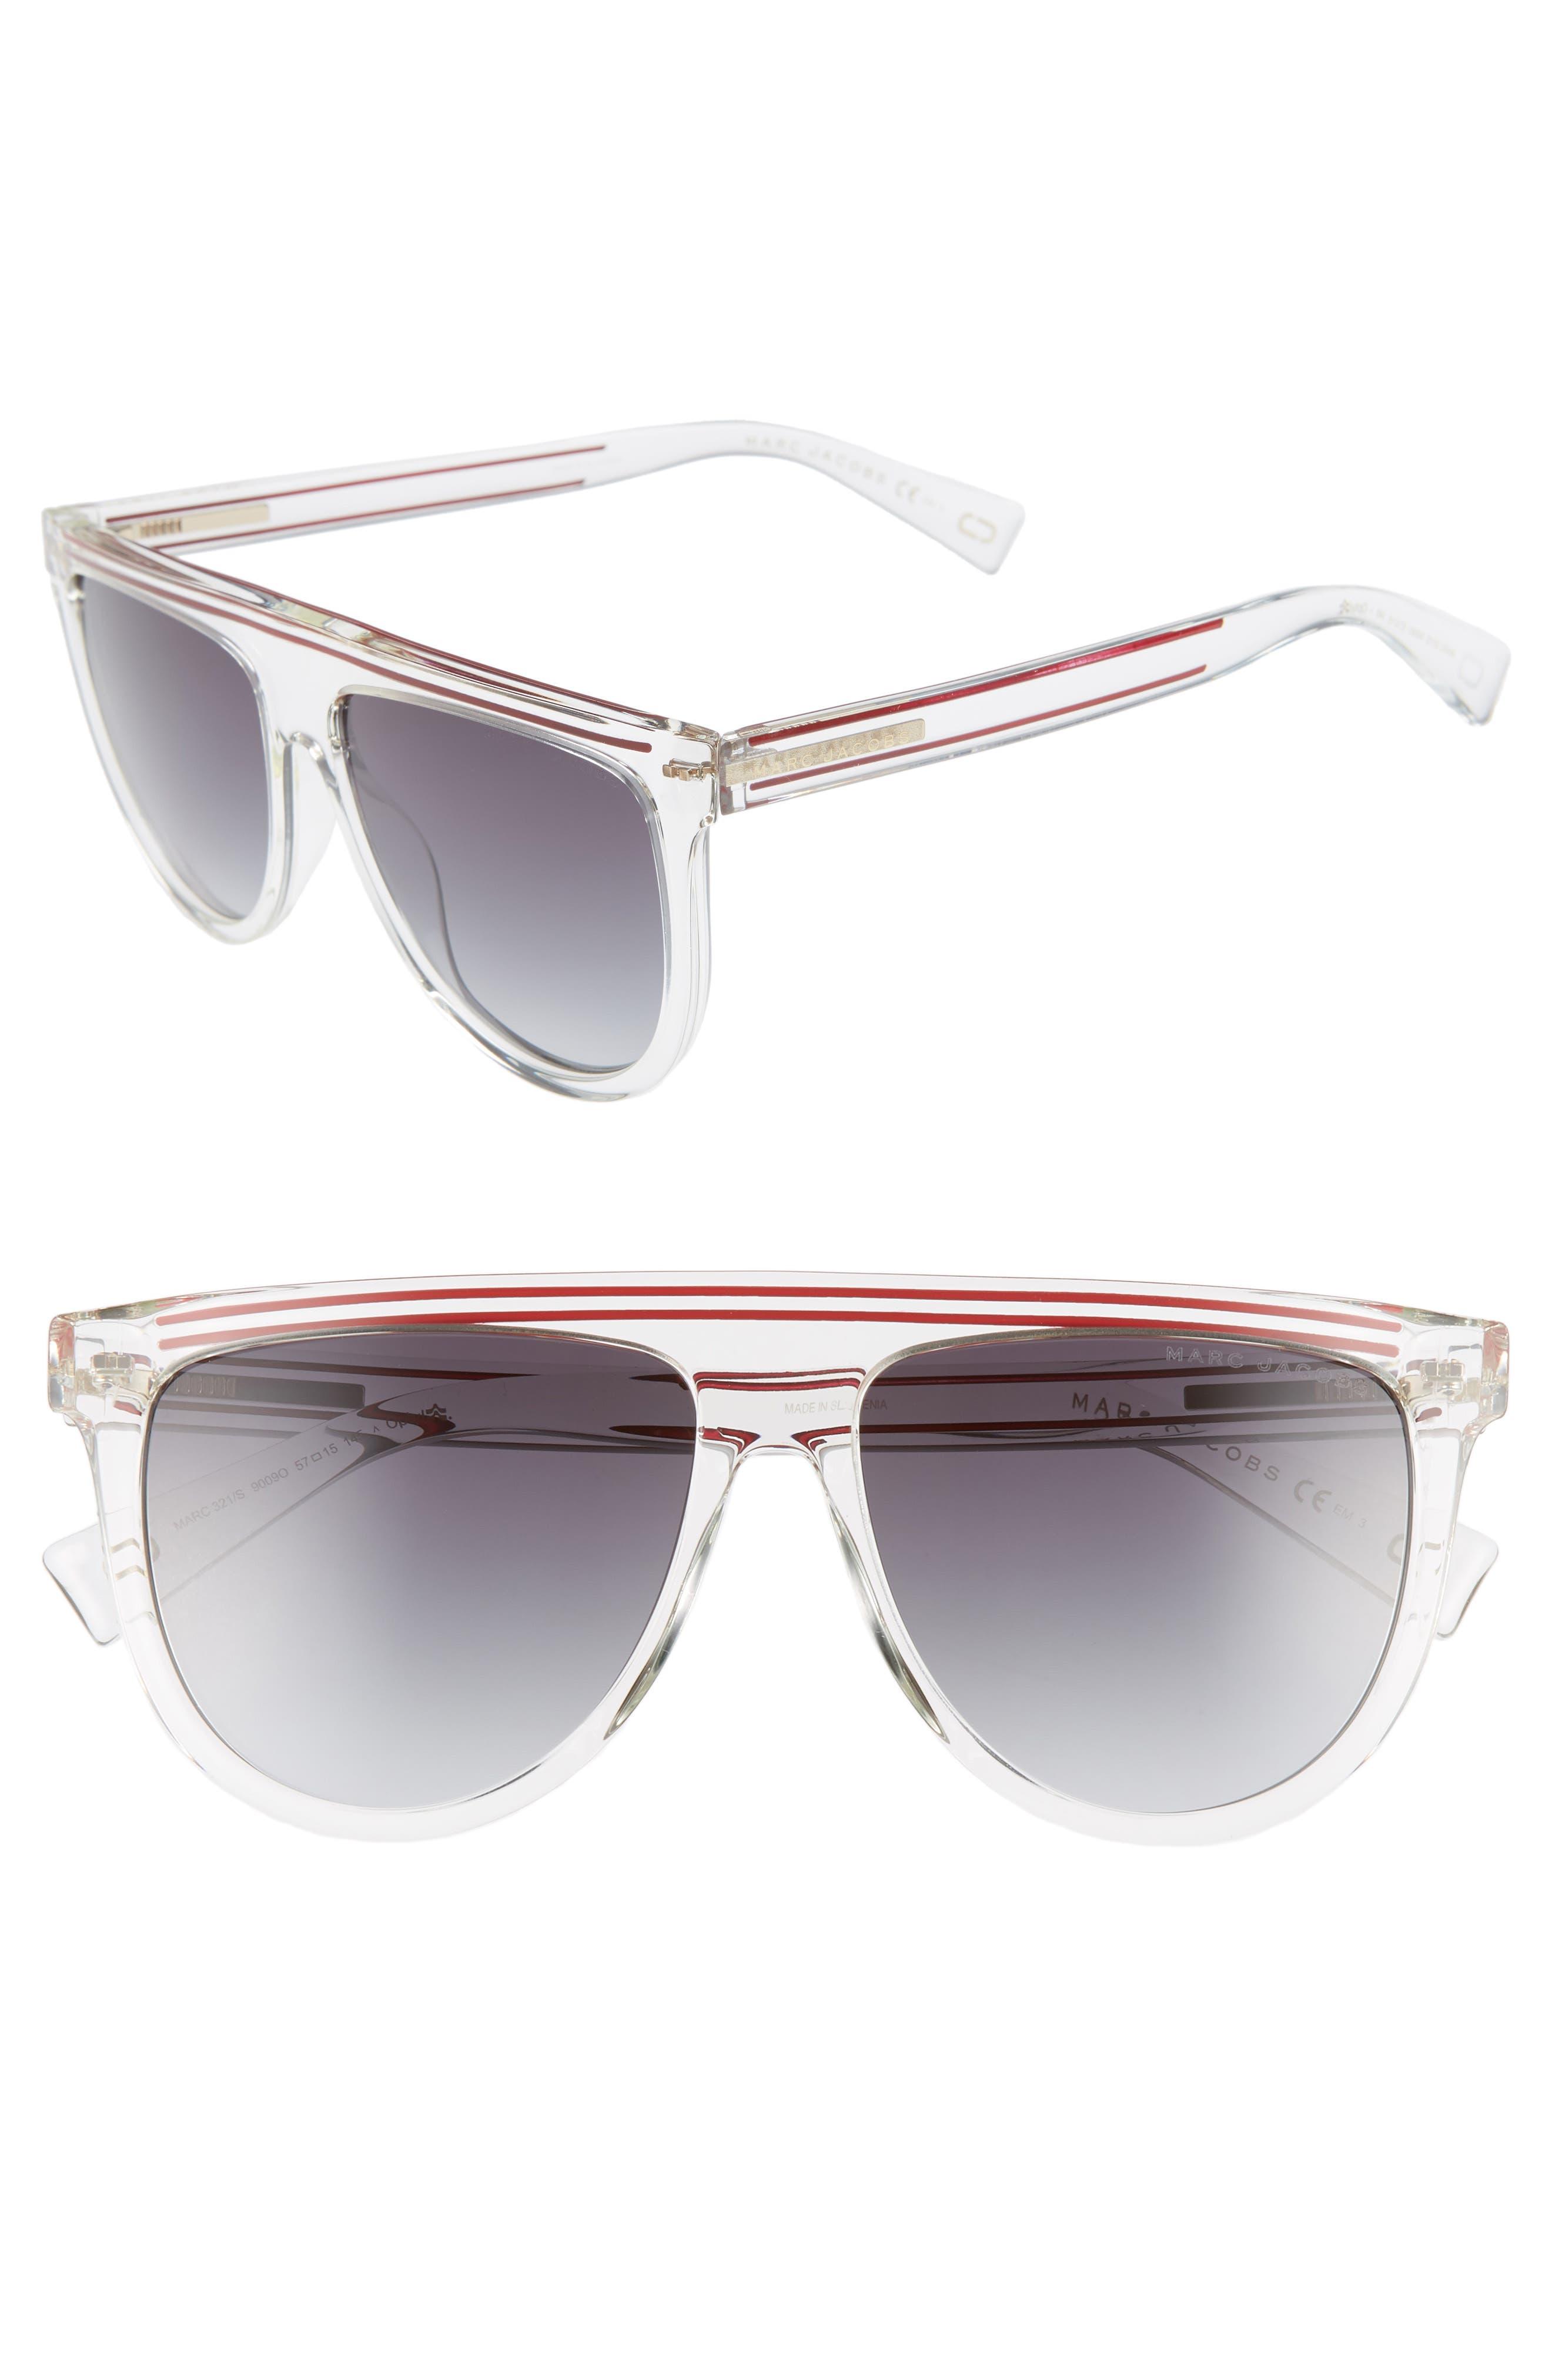 57Mm Gradient Flat Top Sunglasses - Crystal